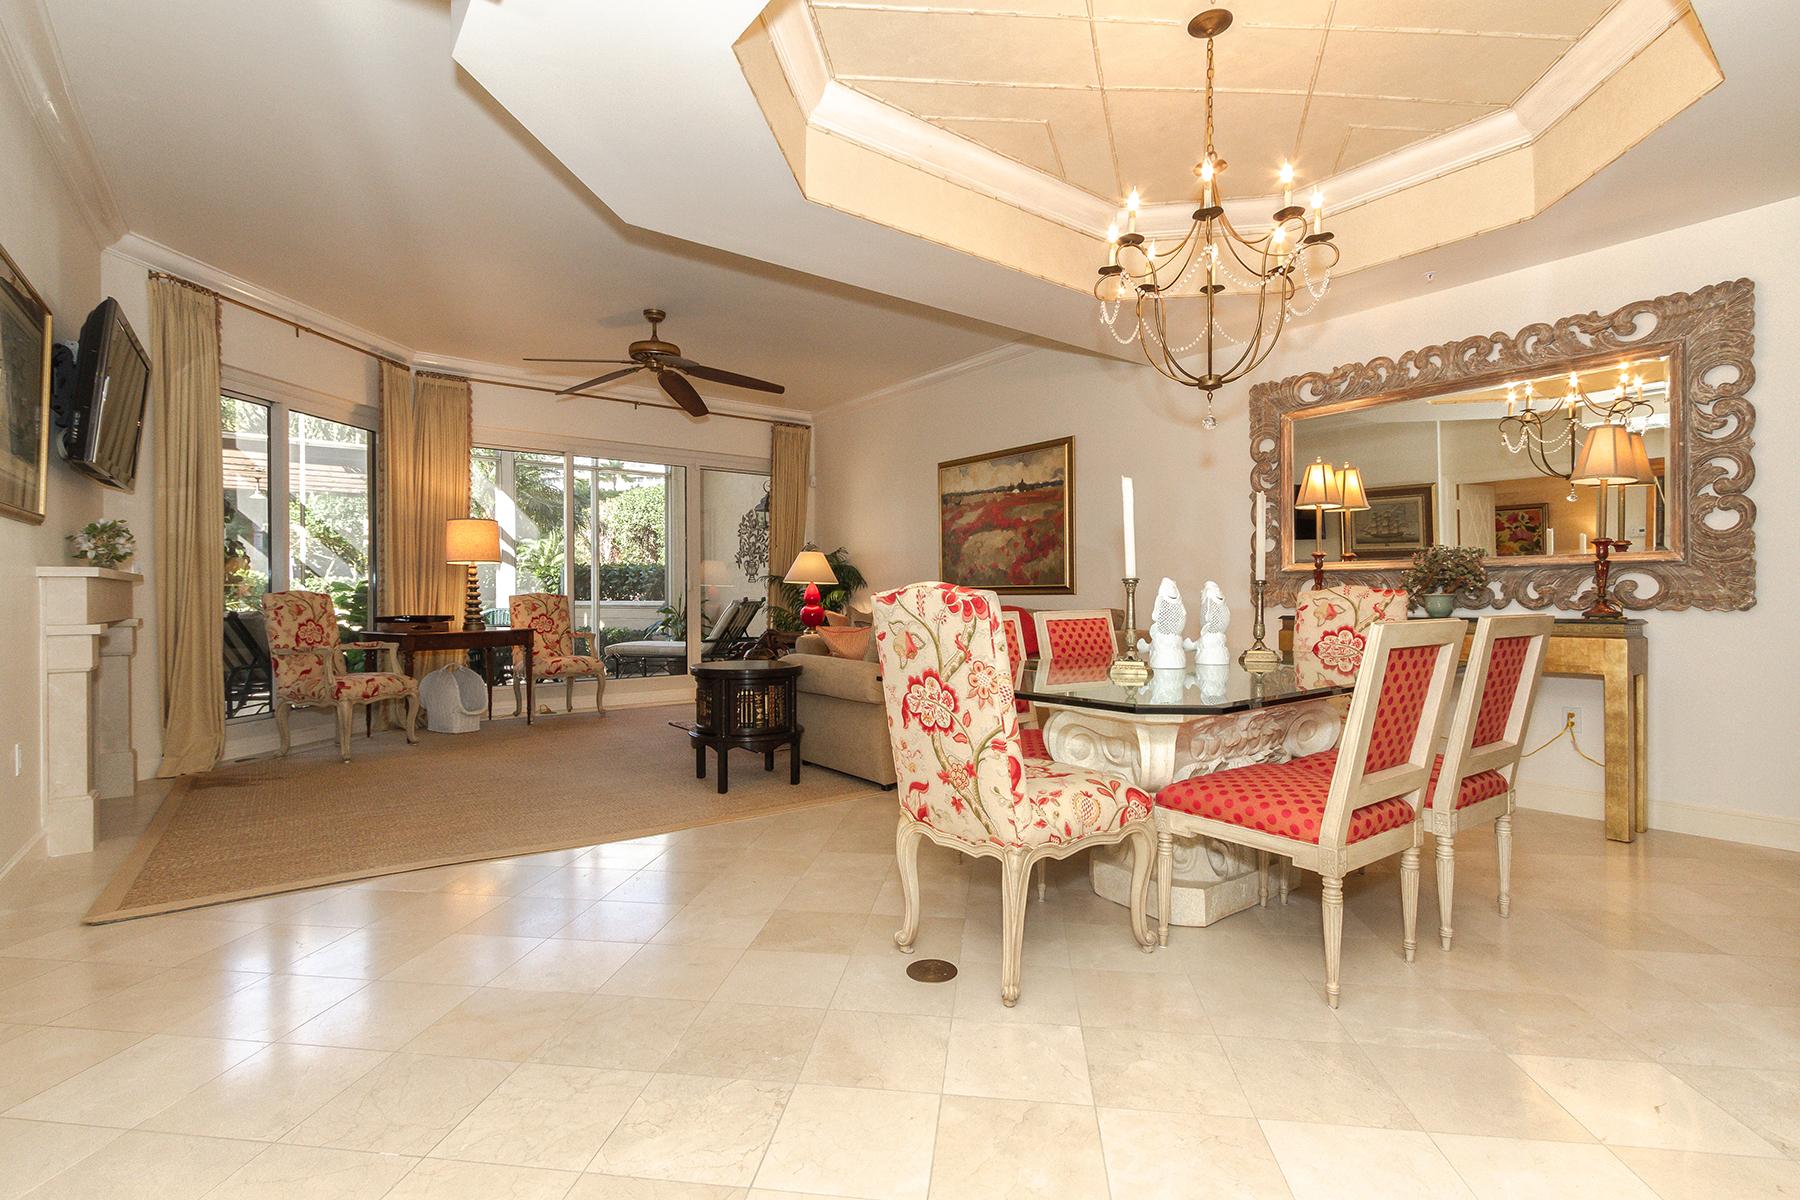 独户住宅 为 出租 在 PARK SHORE - BRITTANY 4021 Gulf Shore Blvd N V19 那不勒斯, 佛罗里达州 34103 美国